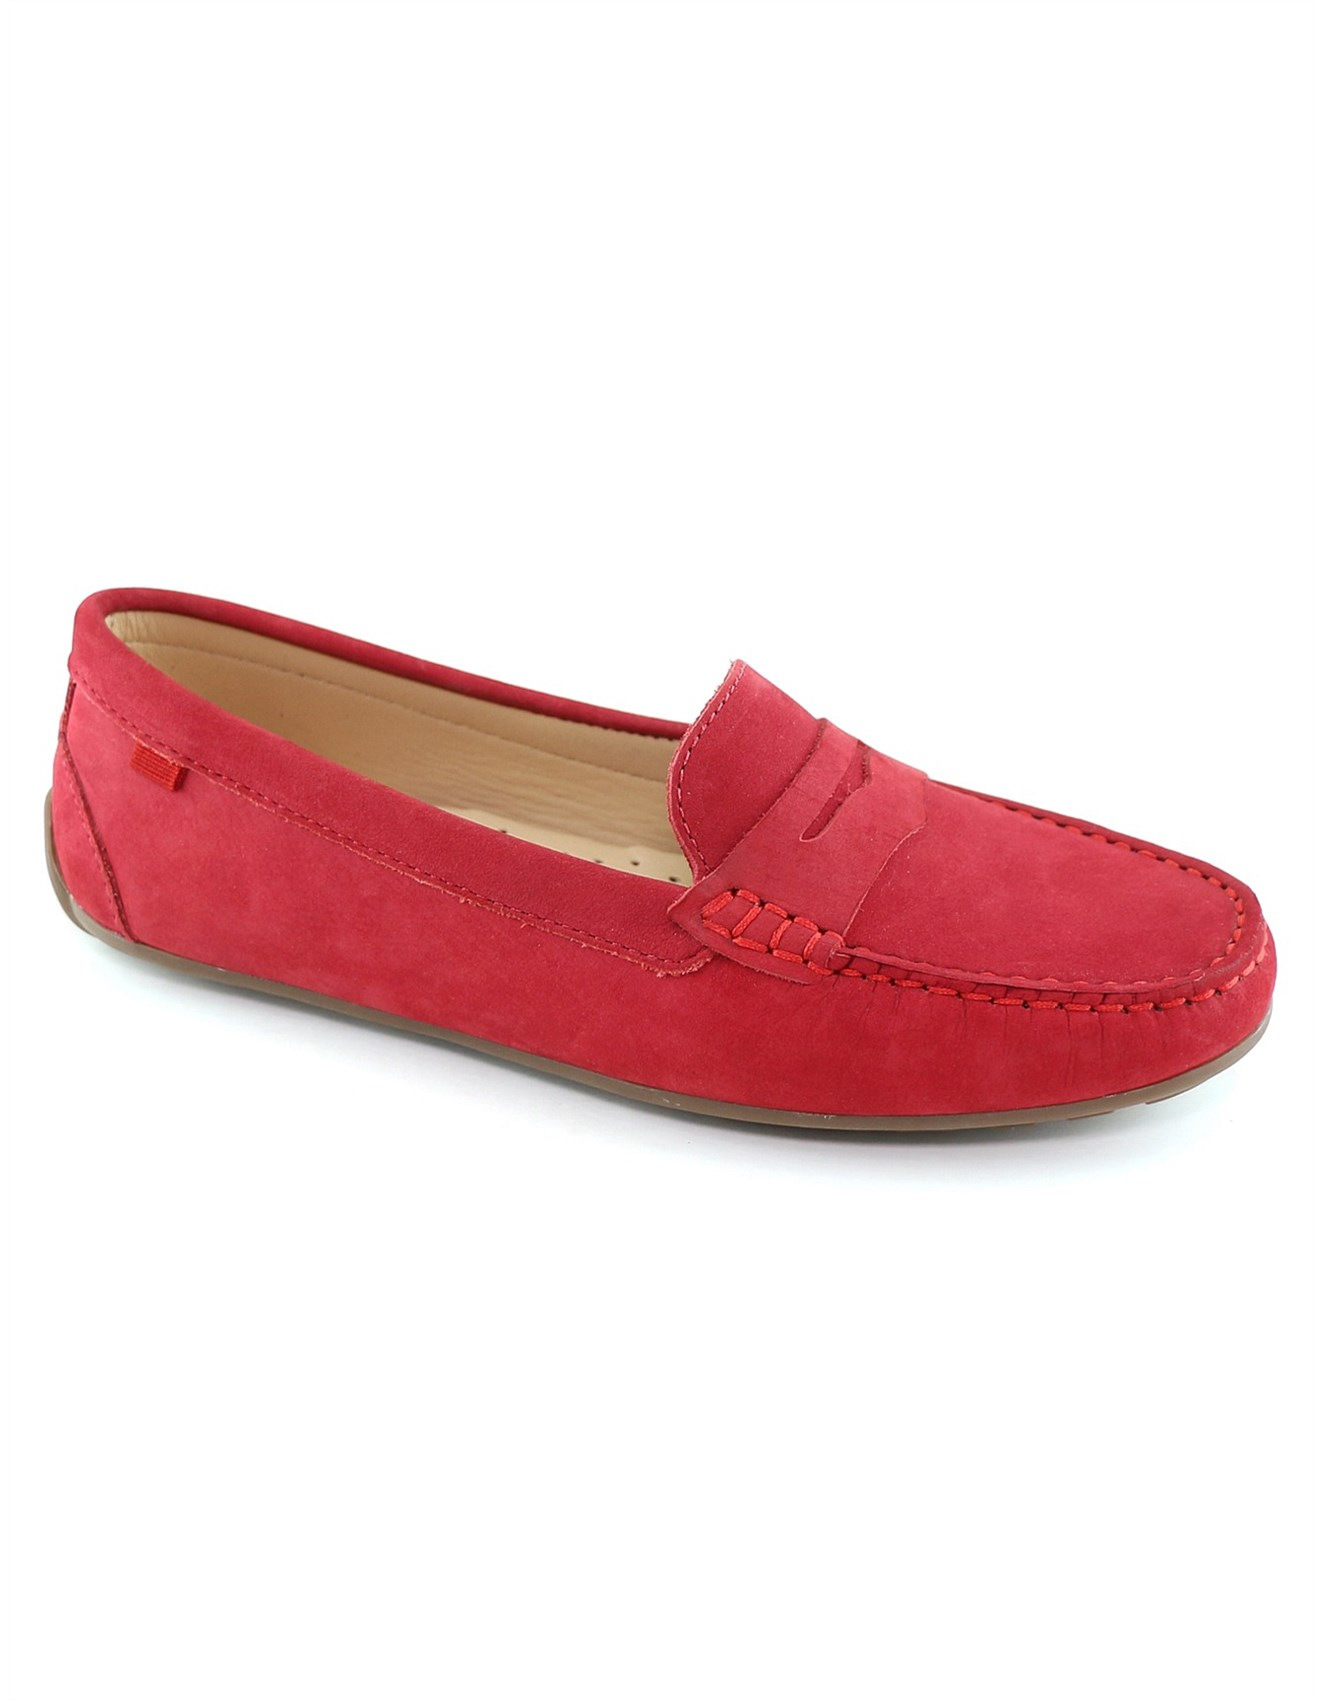 sinappi david jones shoes